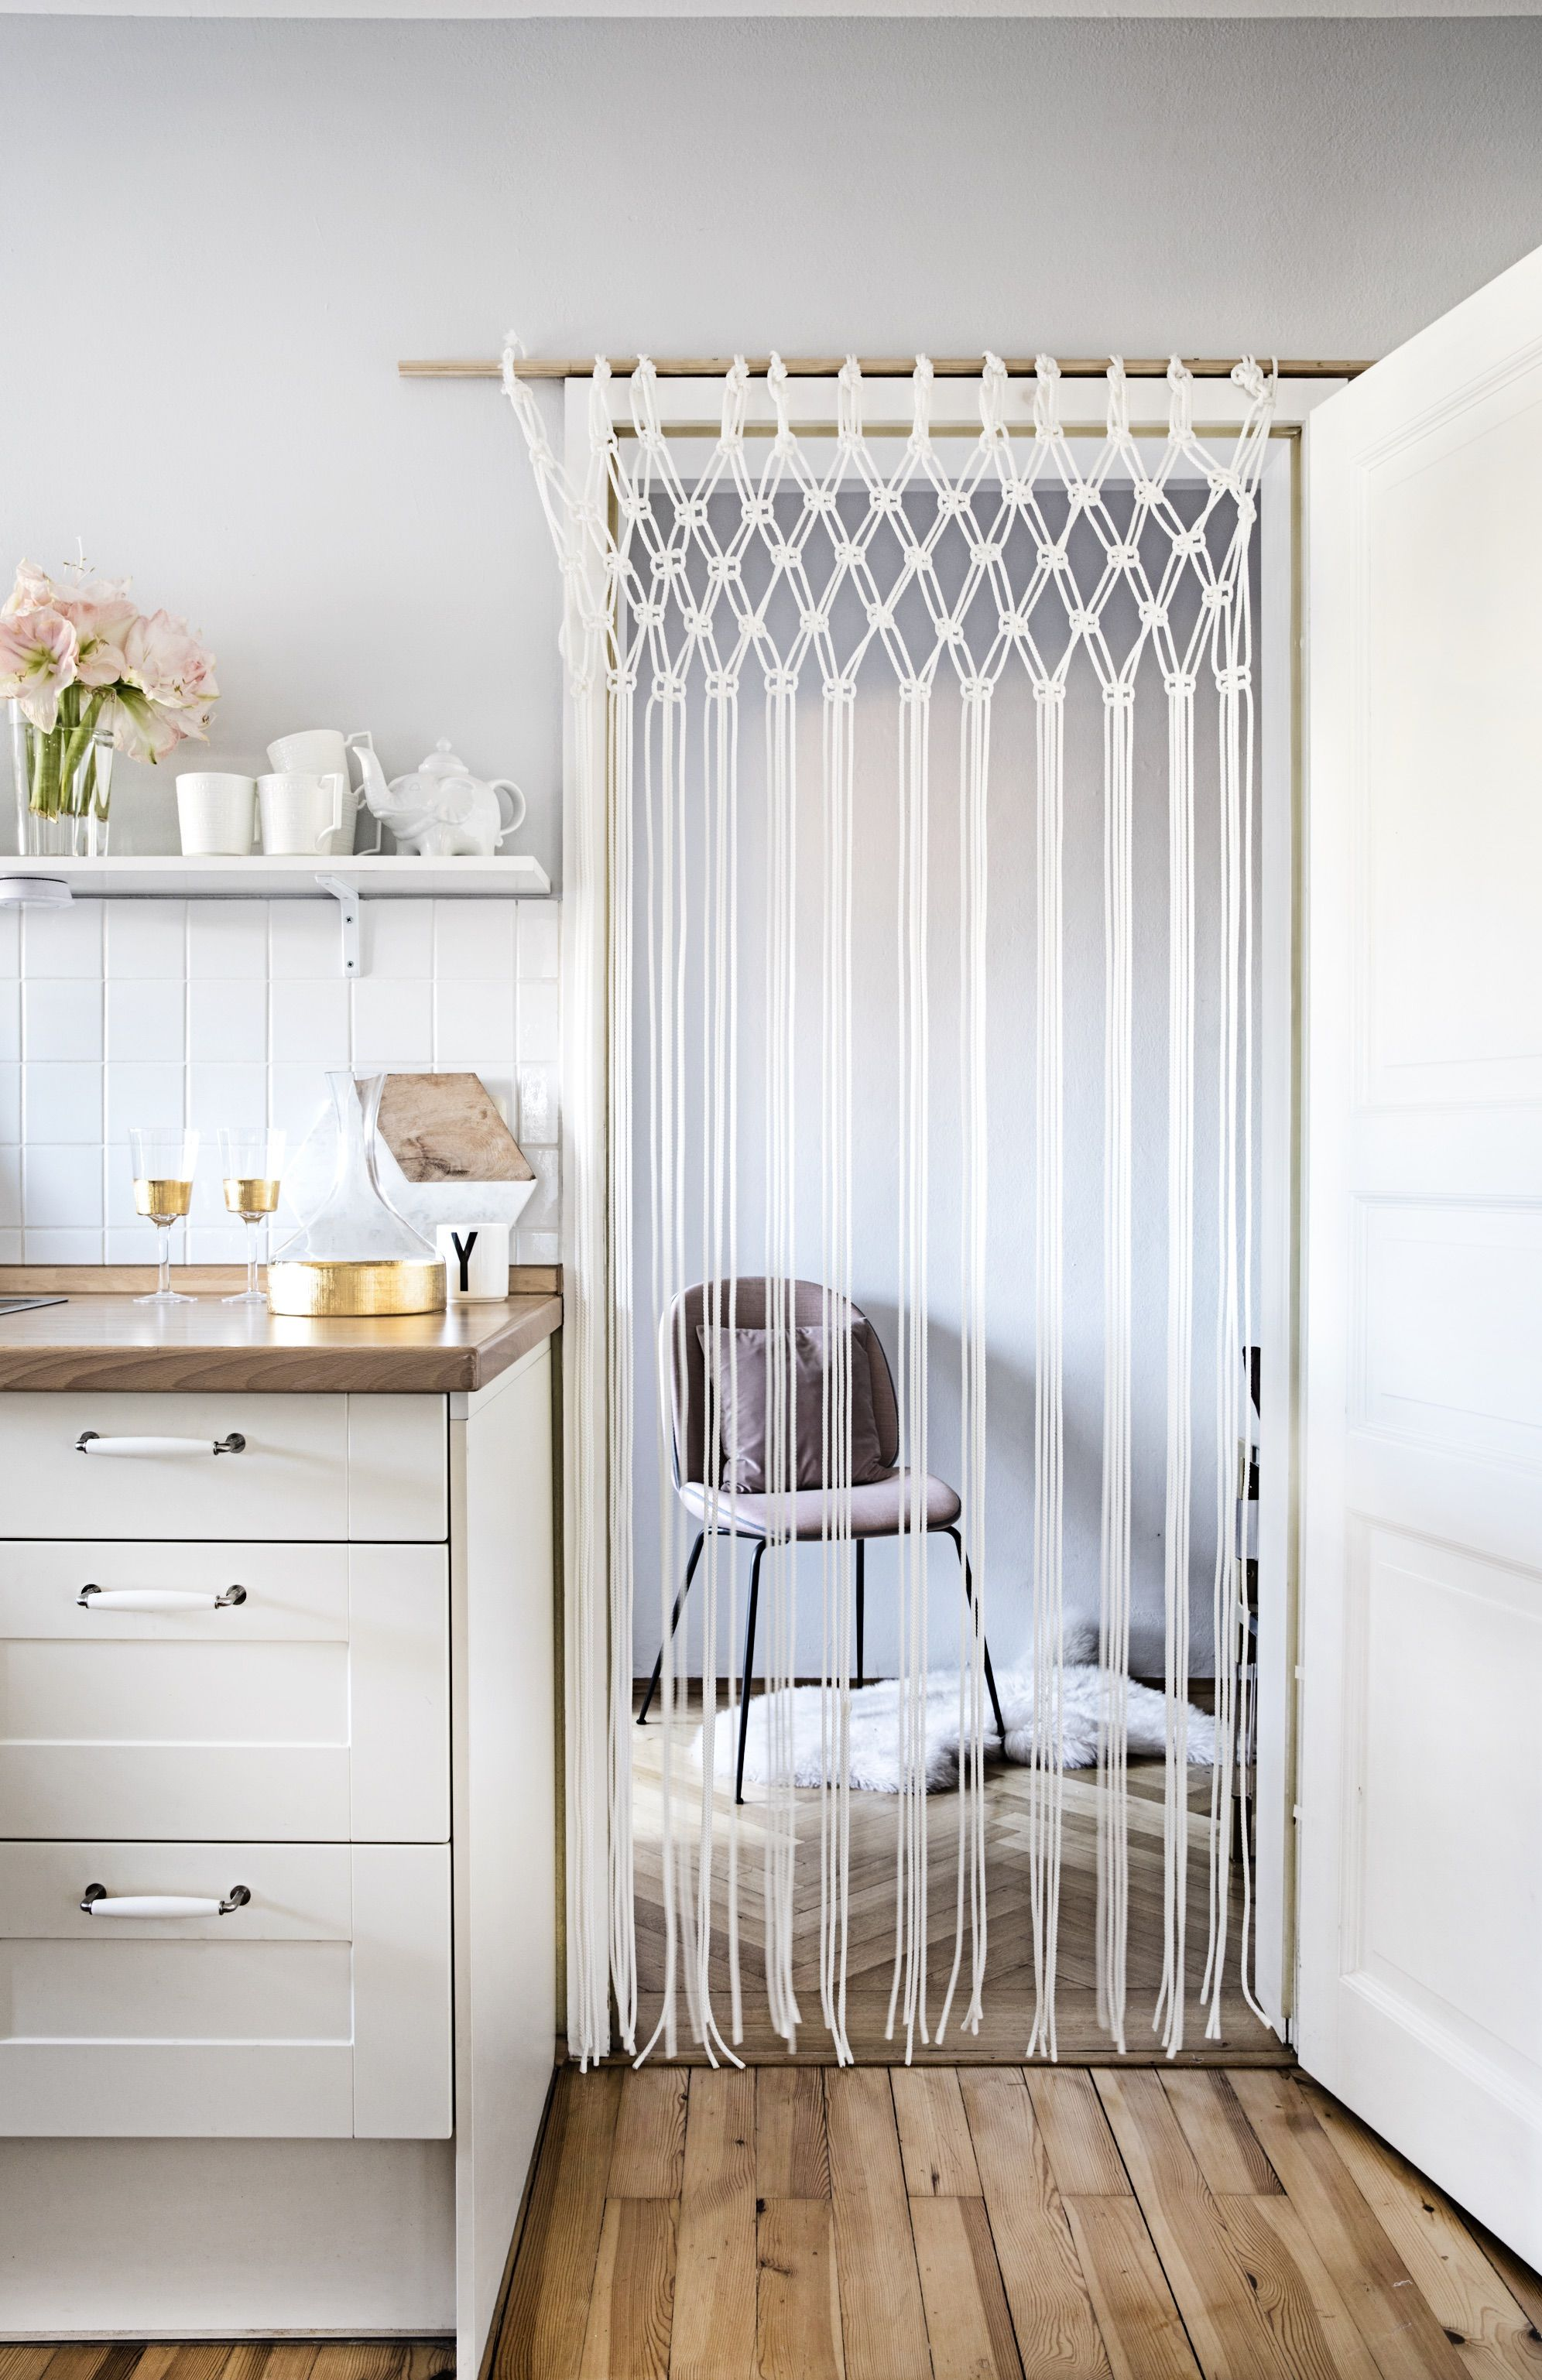 Türvorhang Ikea anleitung für diy makramee vorhang im diys craft and upcycling